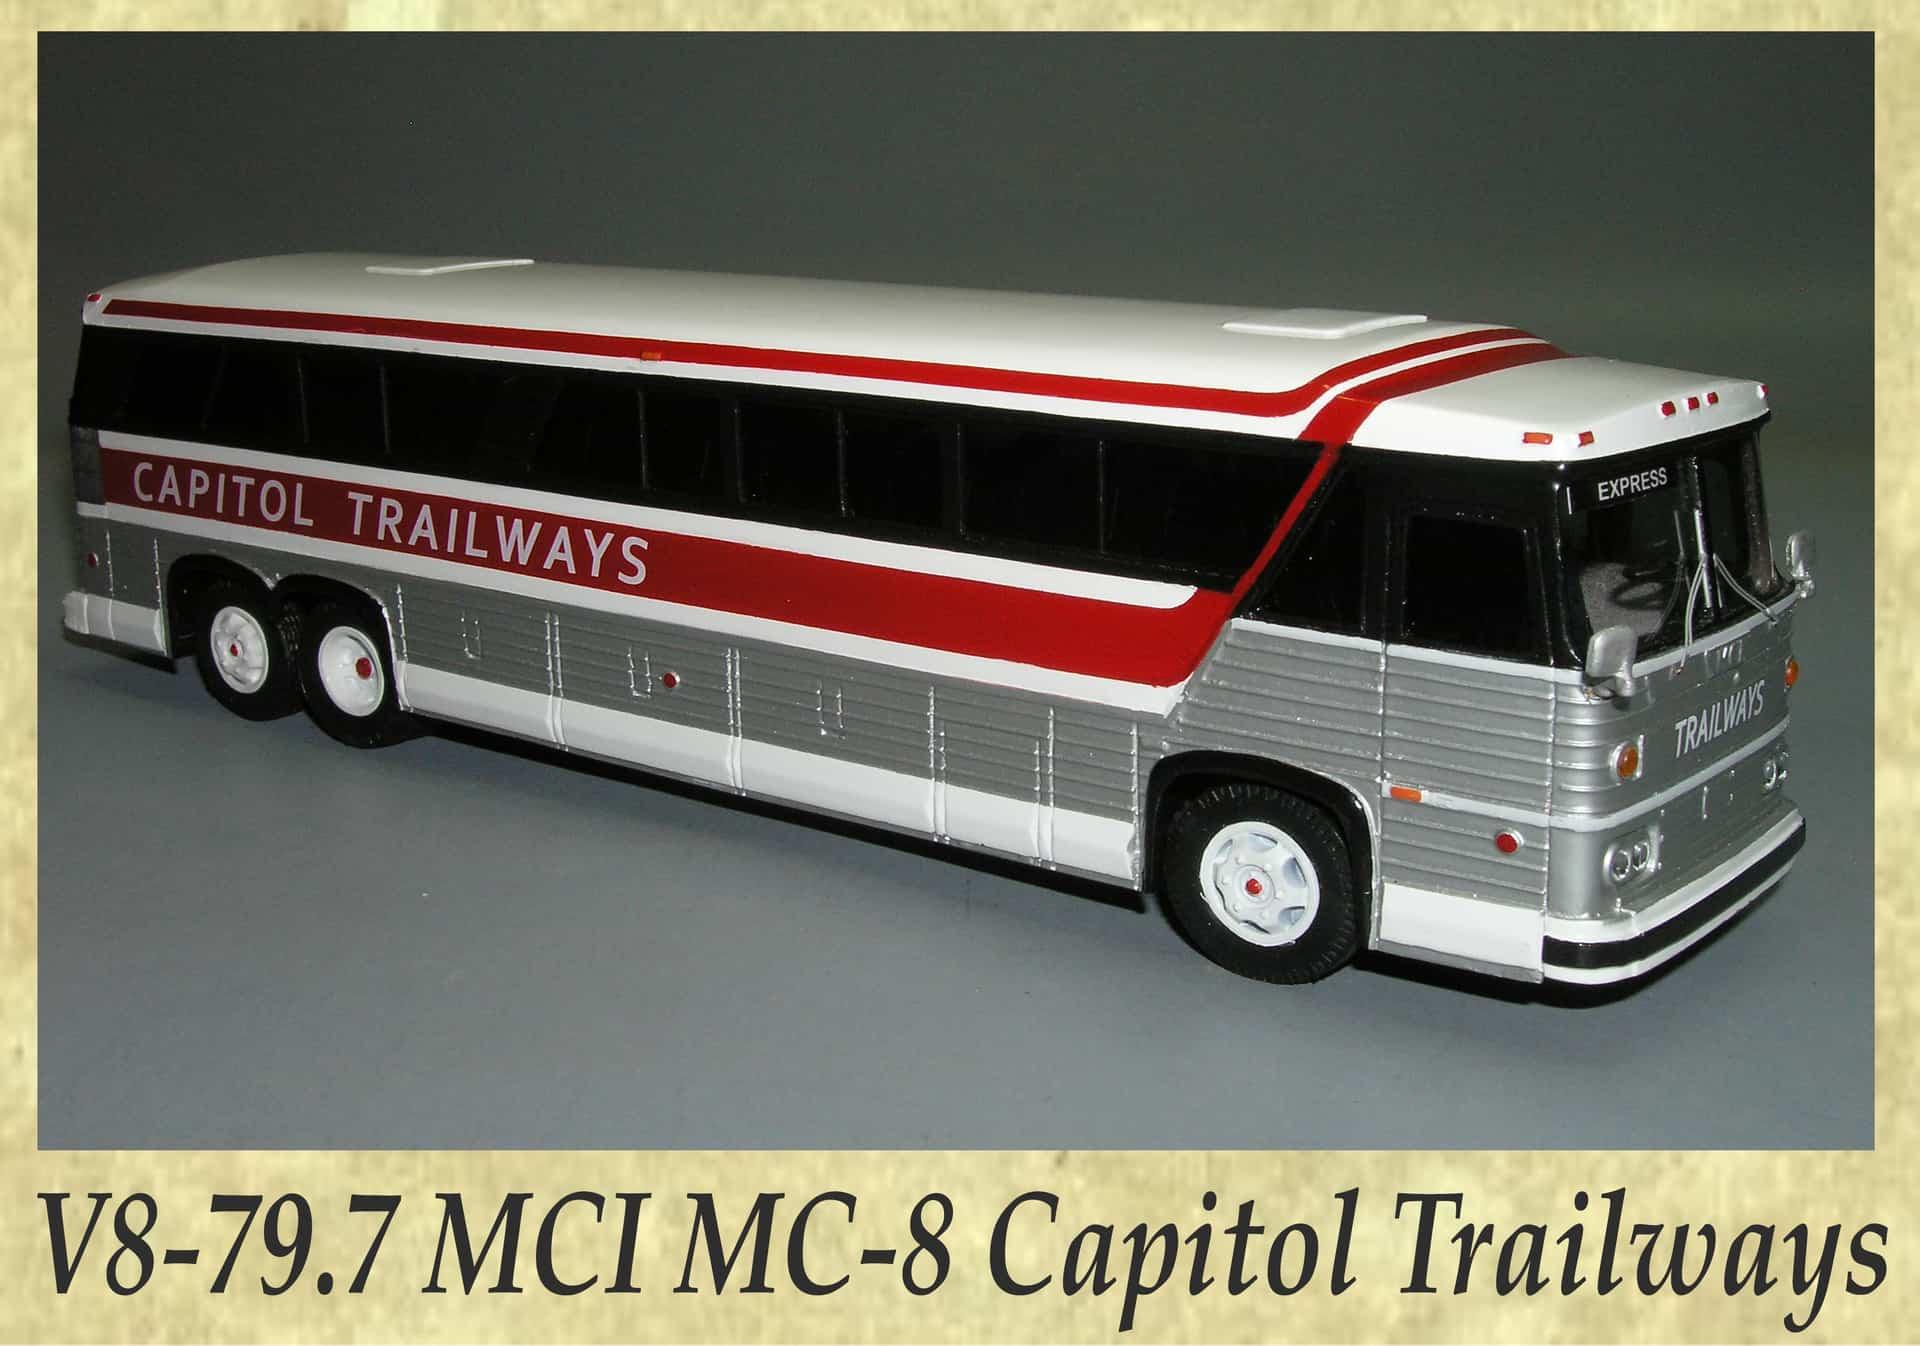 V8-79.7 MCI MC-8 Capitol Trailways